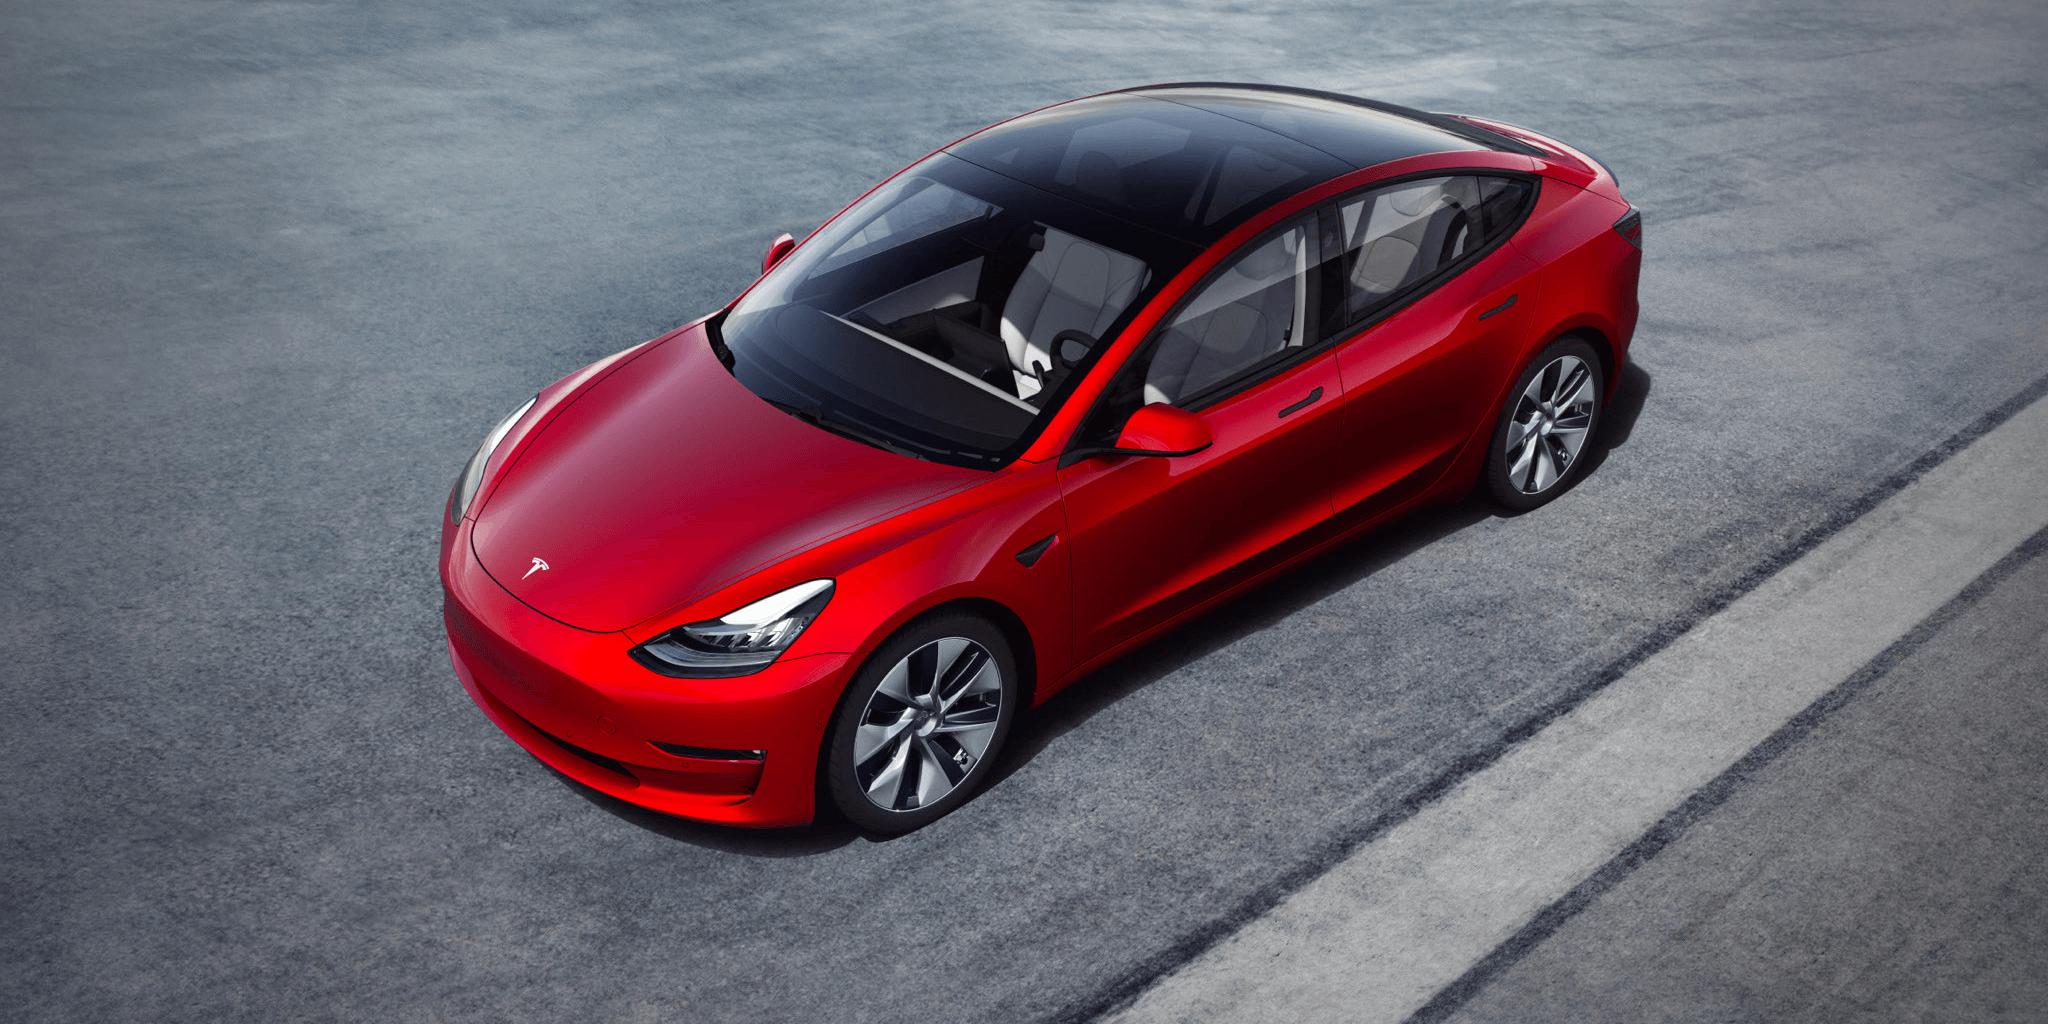 Model 3 奪回全球銷售量冠軍 台灣第一季電動車掛牌 1,528 輛